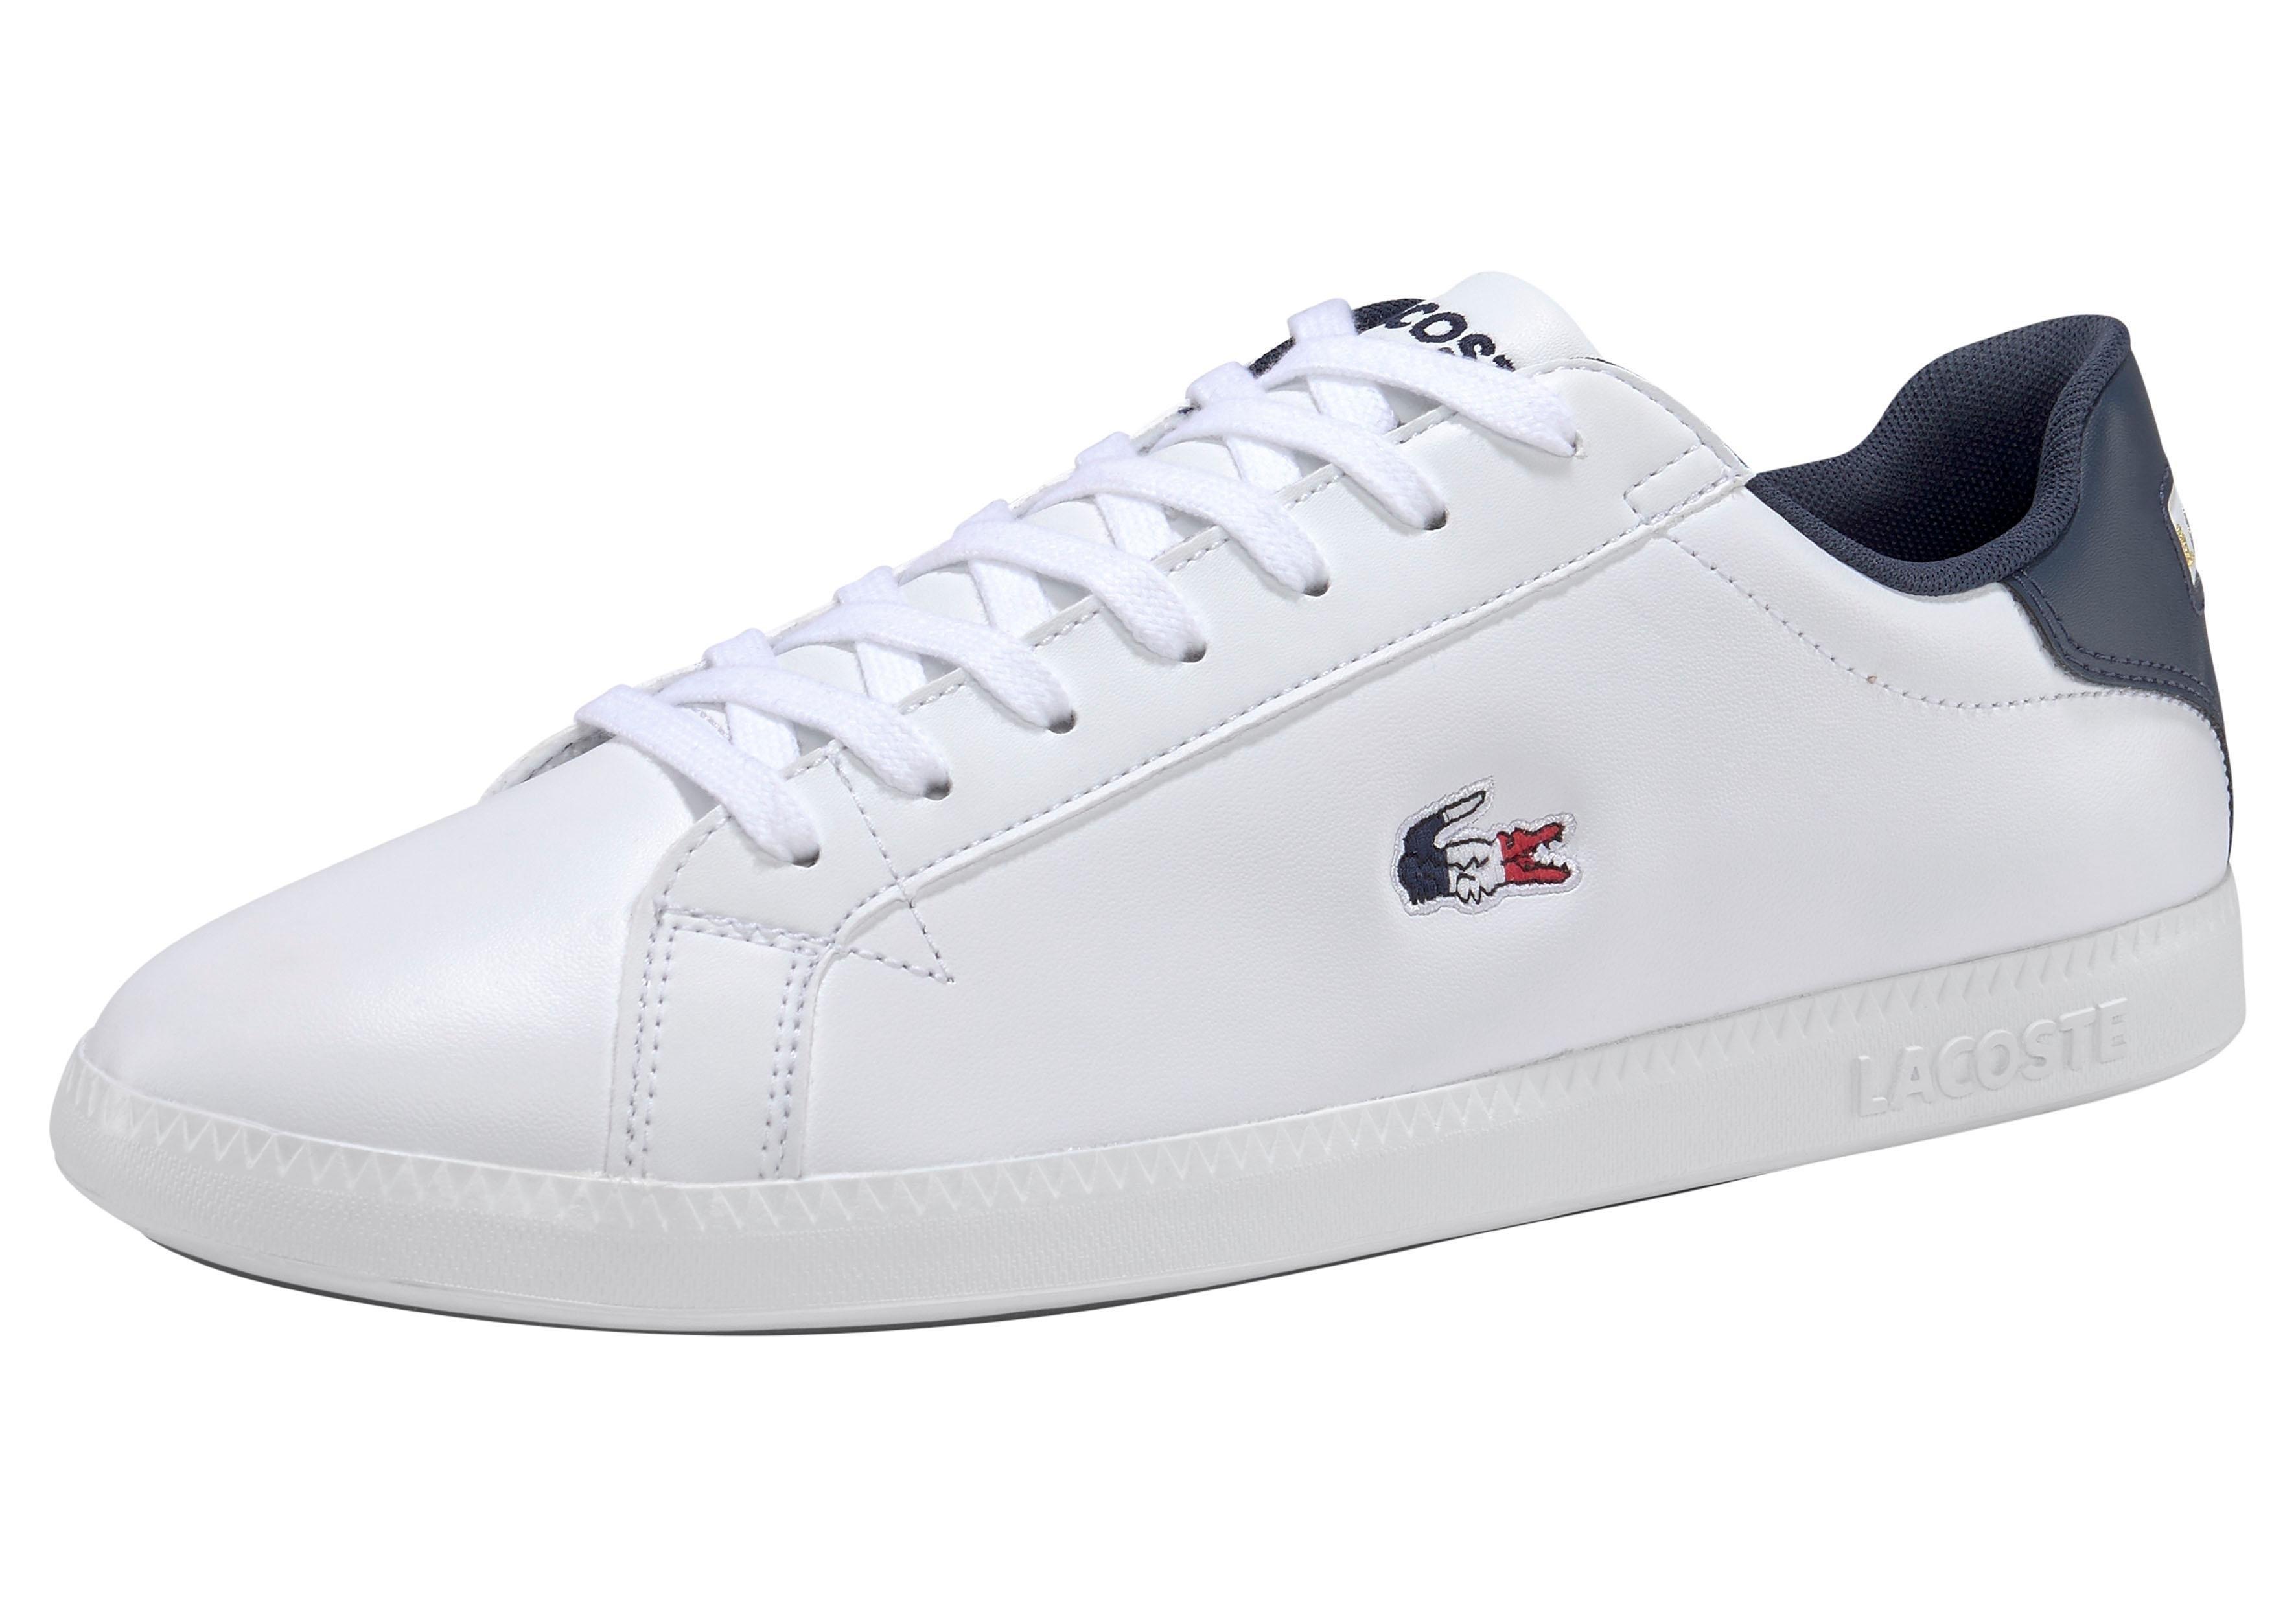 Lacoste sneakers GRADUATE TRI1 SMA veilig op otto.nl kopen